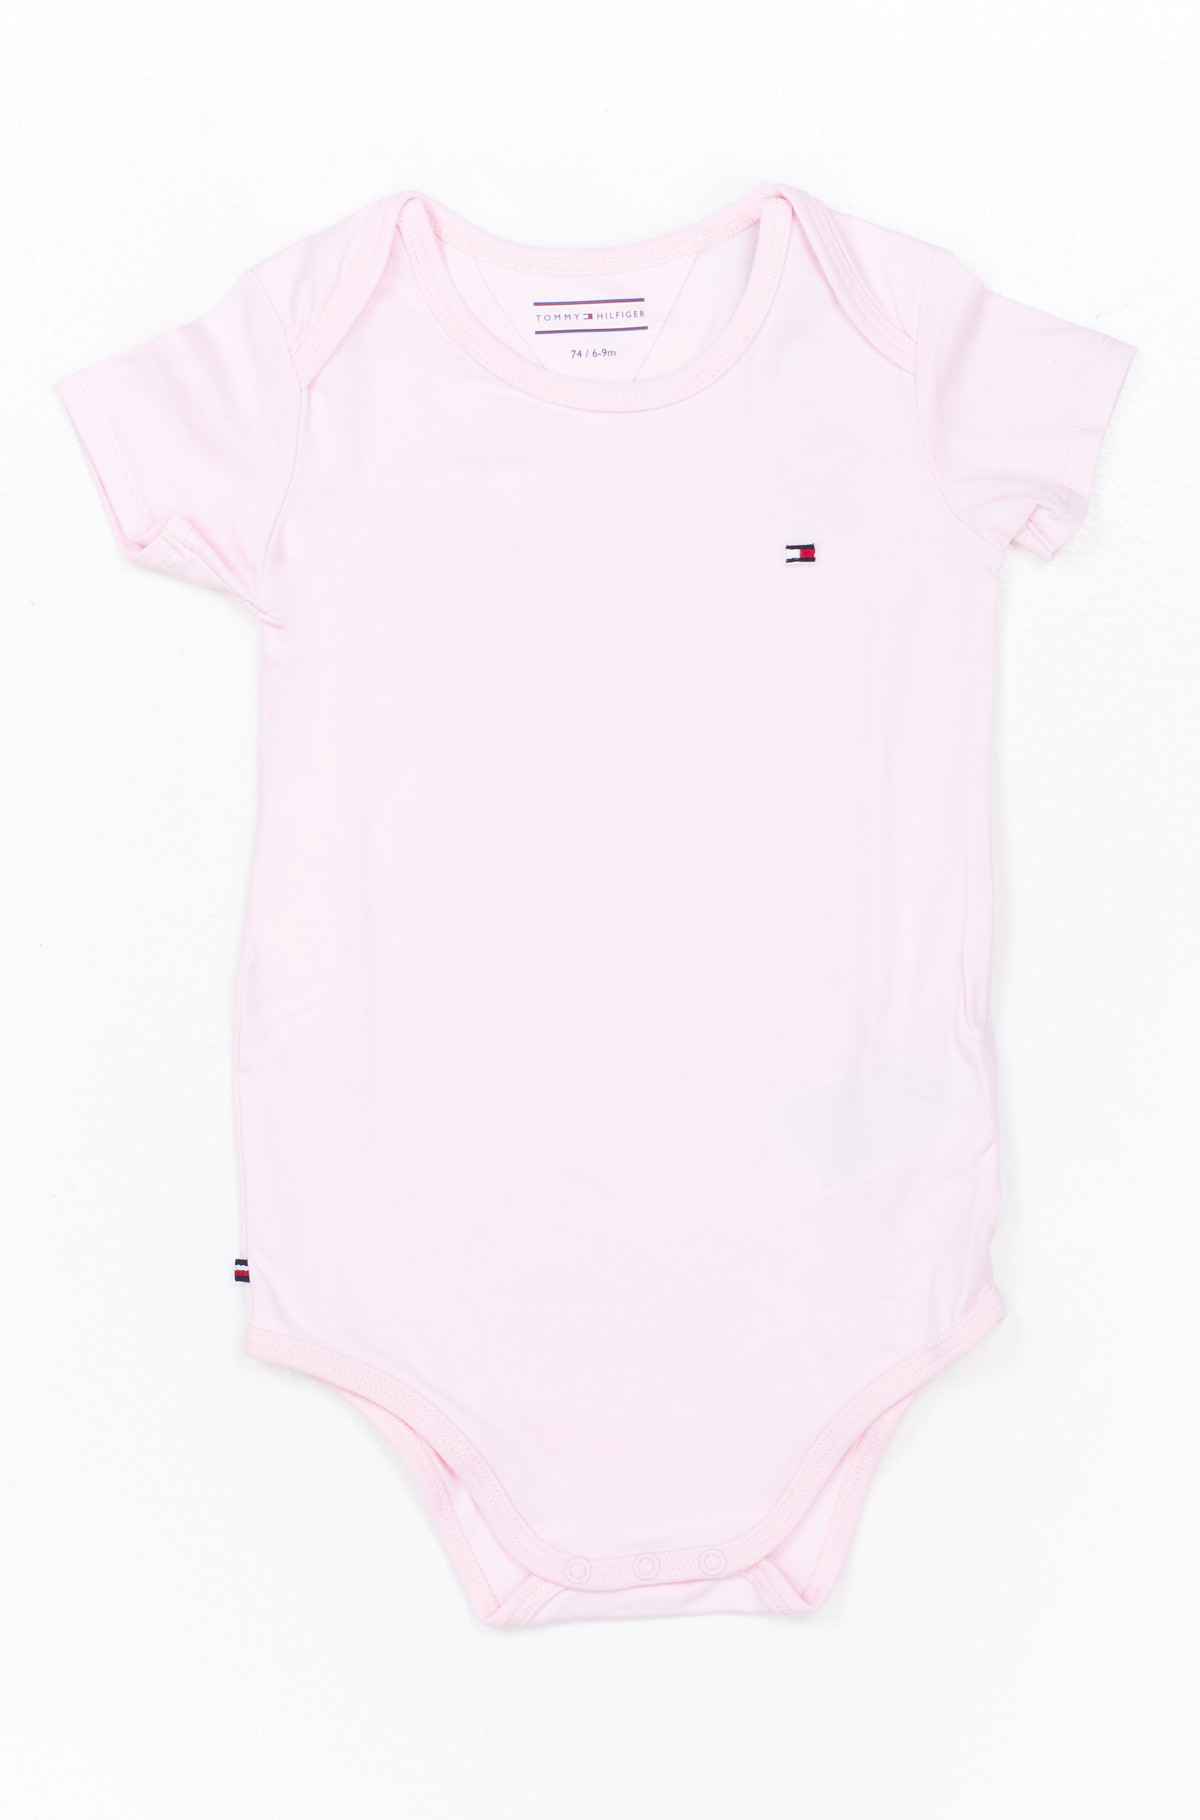 Vaikiško kūno sudėjimas BODY S/S BABY 3 PACK-full-3